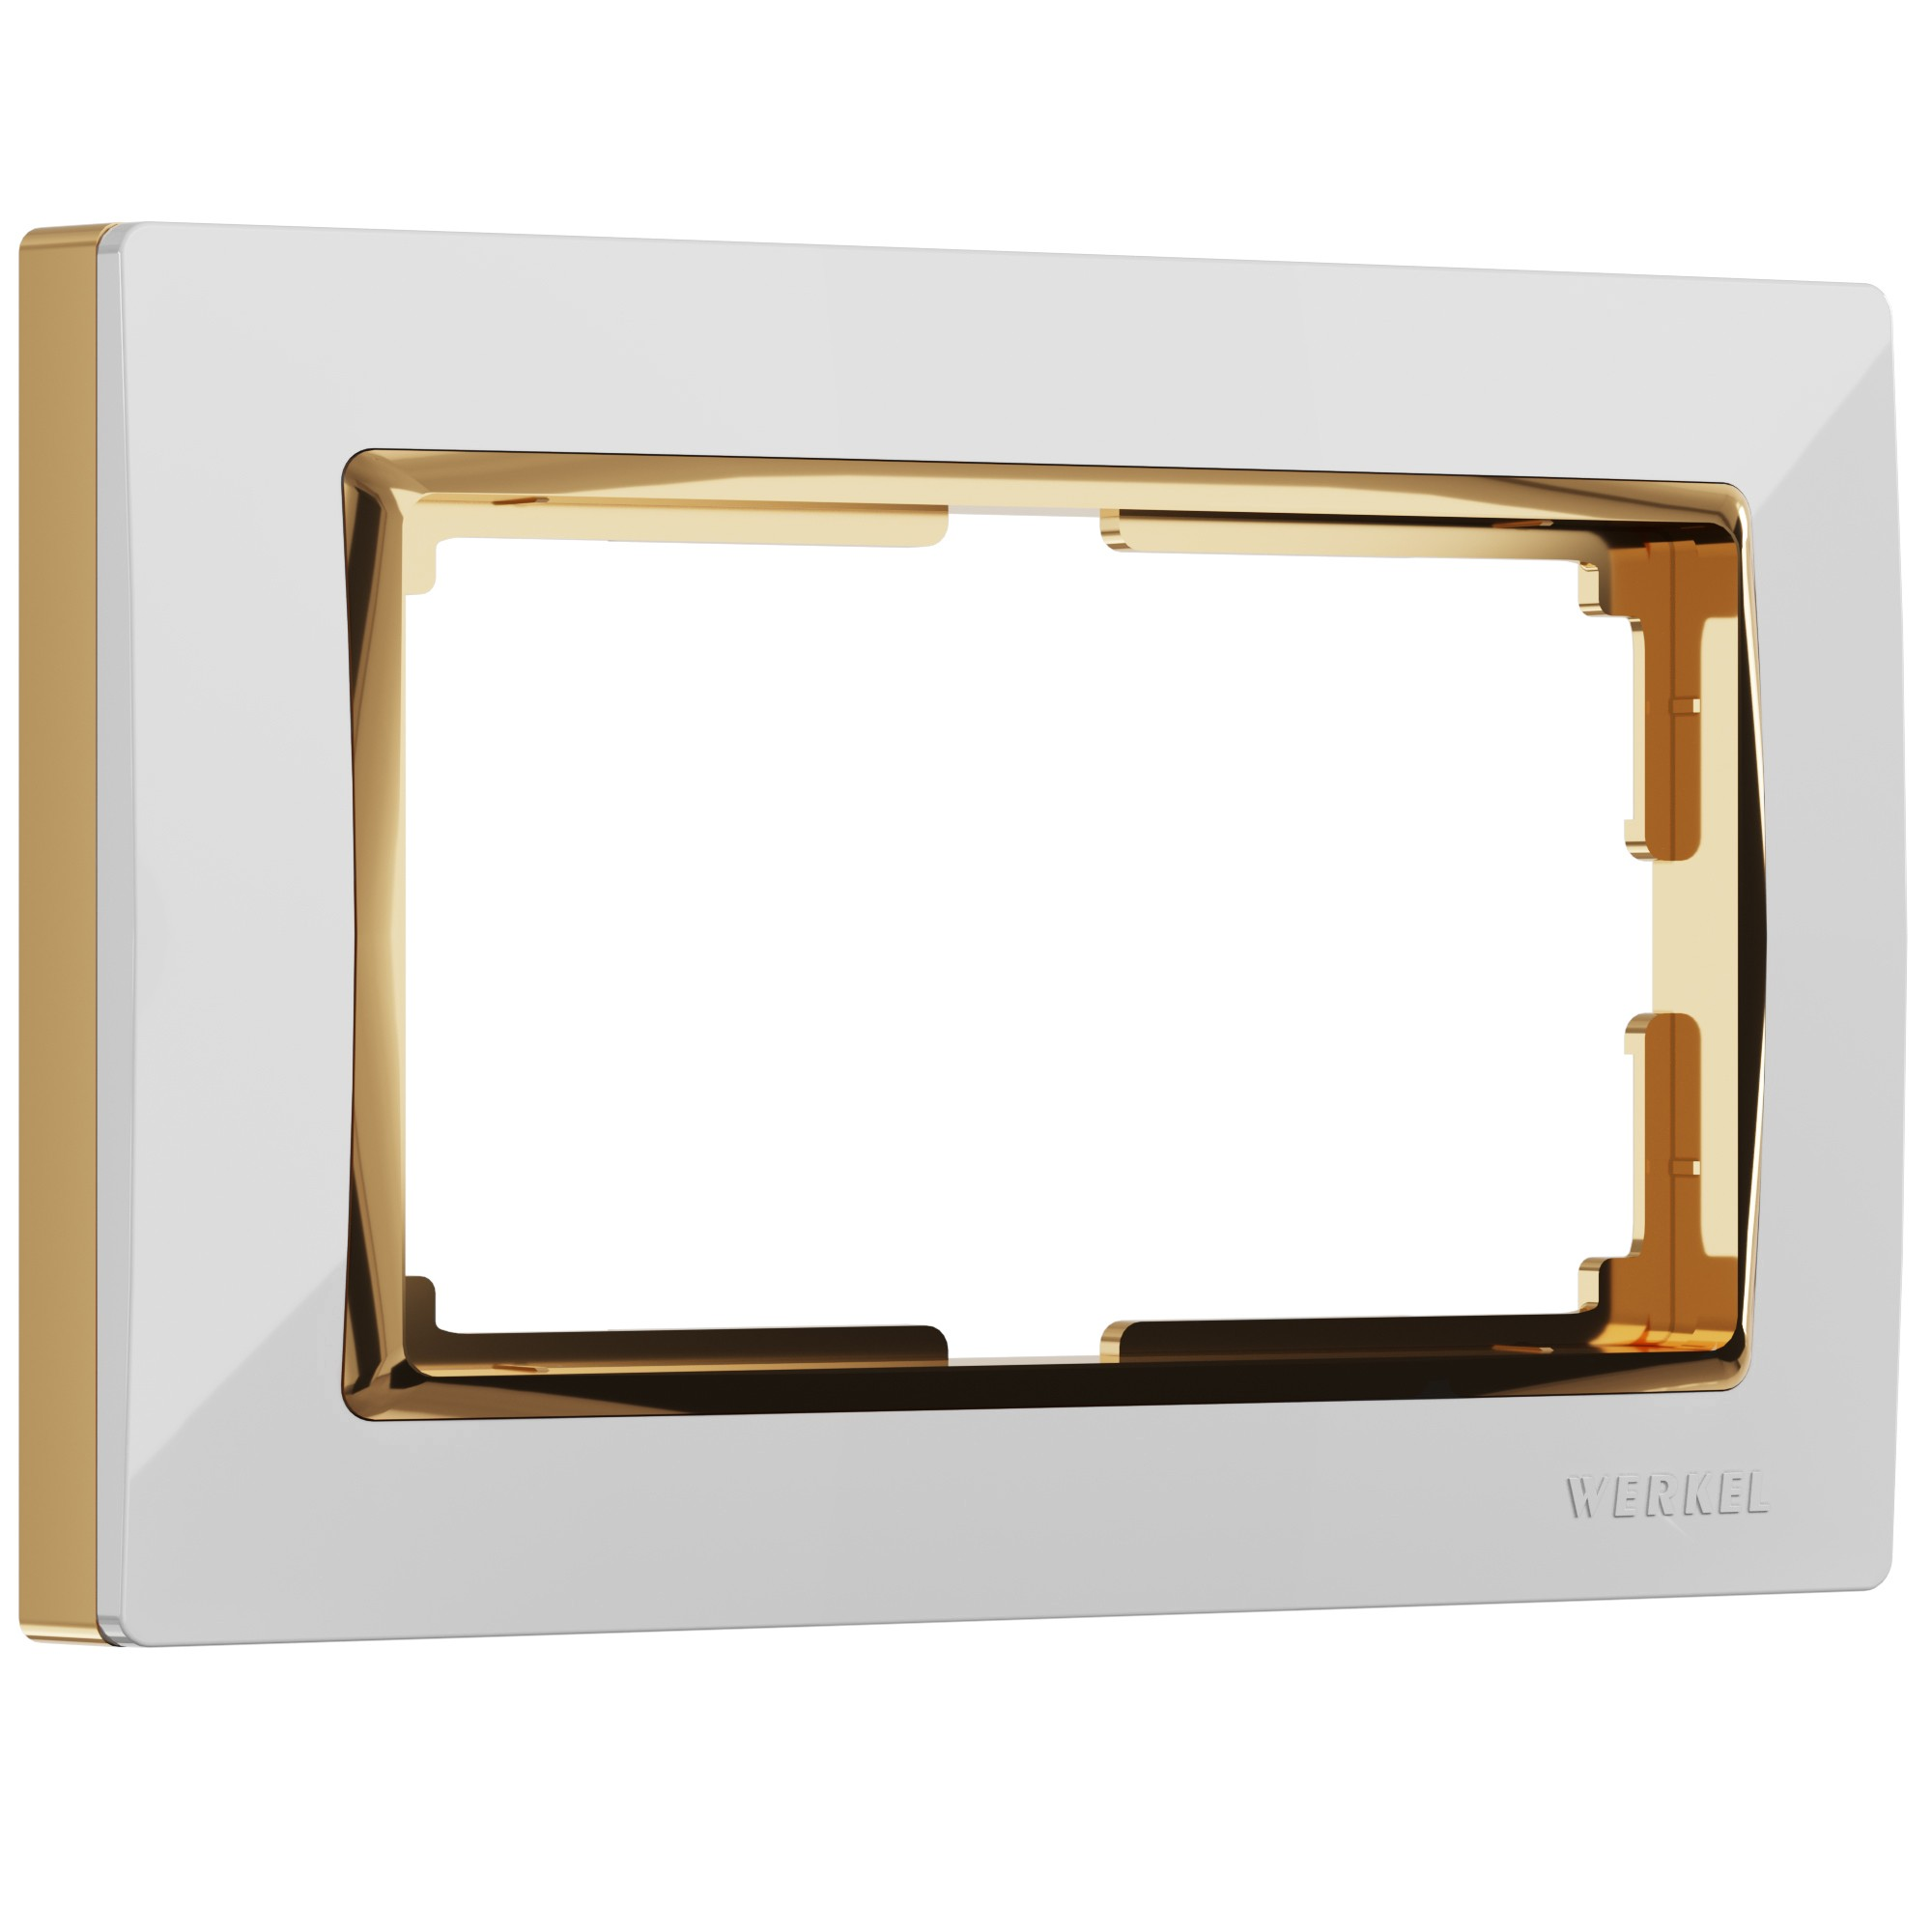 WL03-Frame-01-DBL-white-GD/ Рамка для двойной розетки (белый/золото)